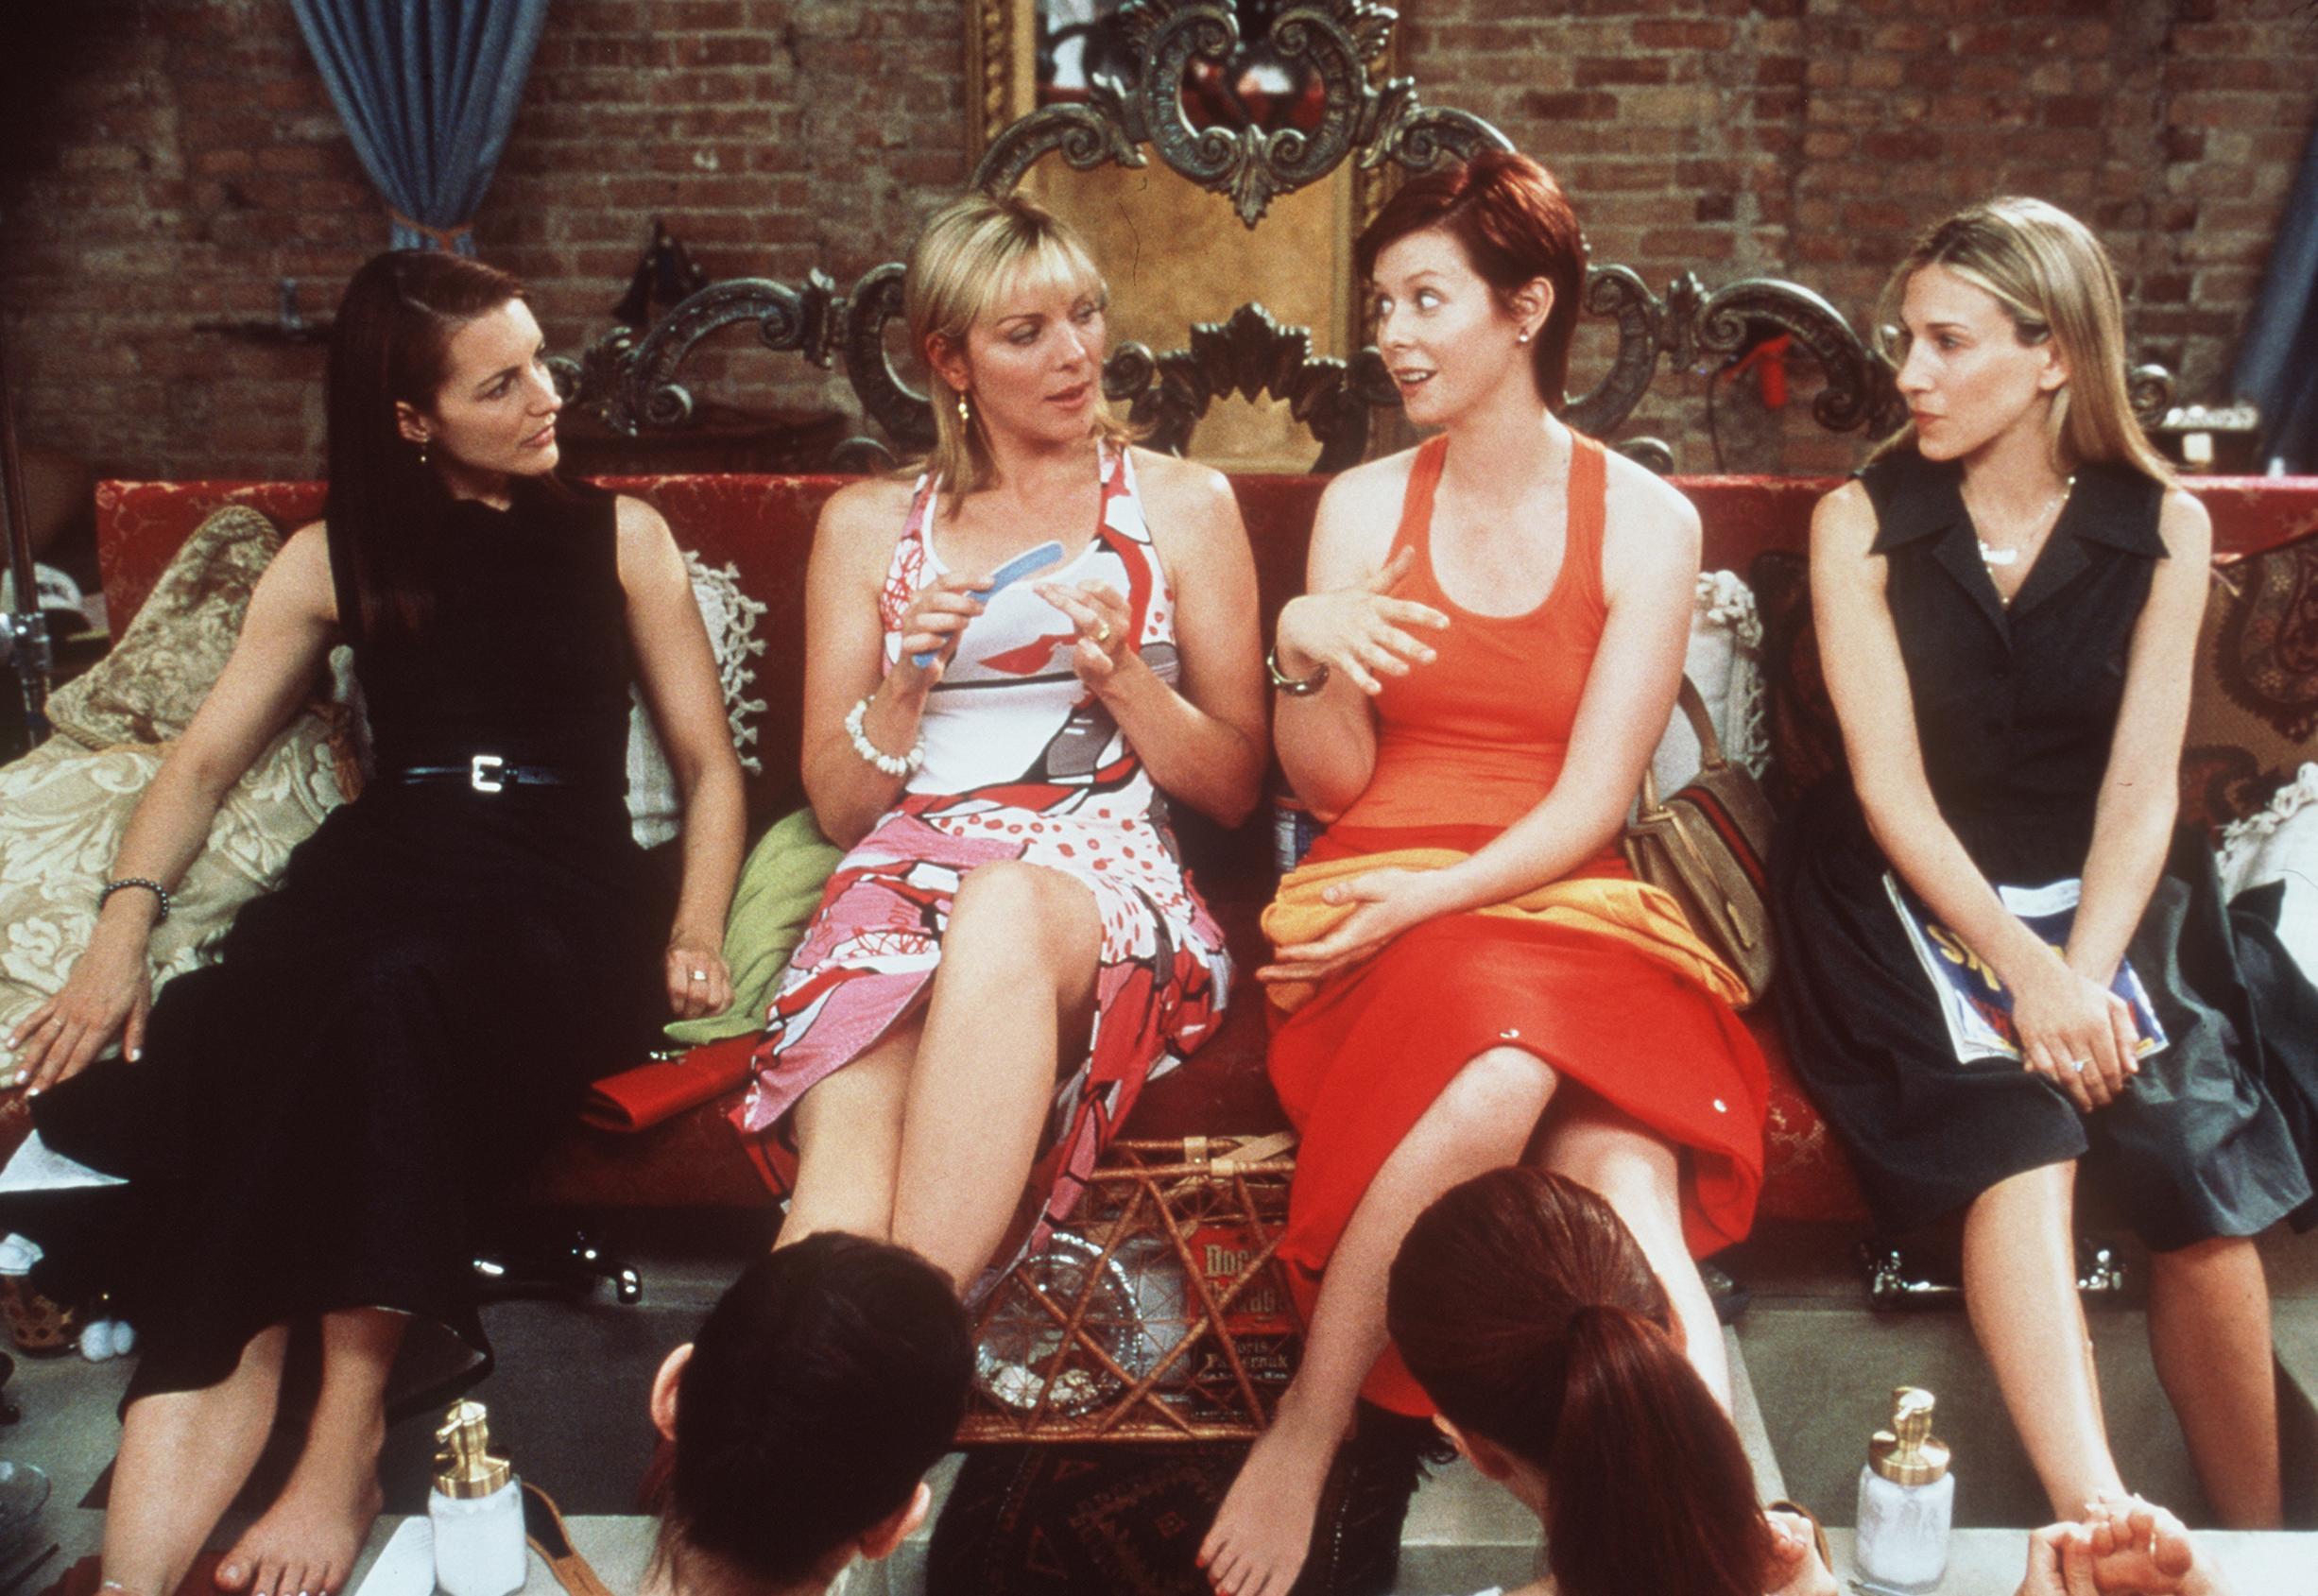 Sex And The City cast Kristin Davis, Kim Cattrall, Cynthia Nixon, and Sarah Jessica Parker in 1999